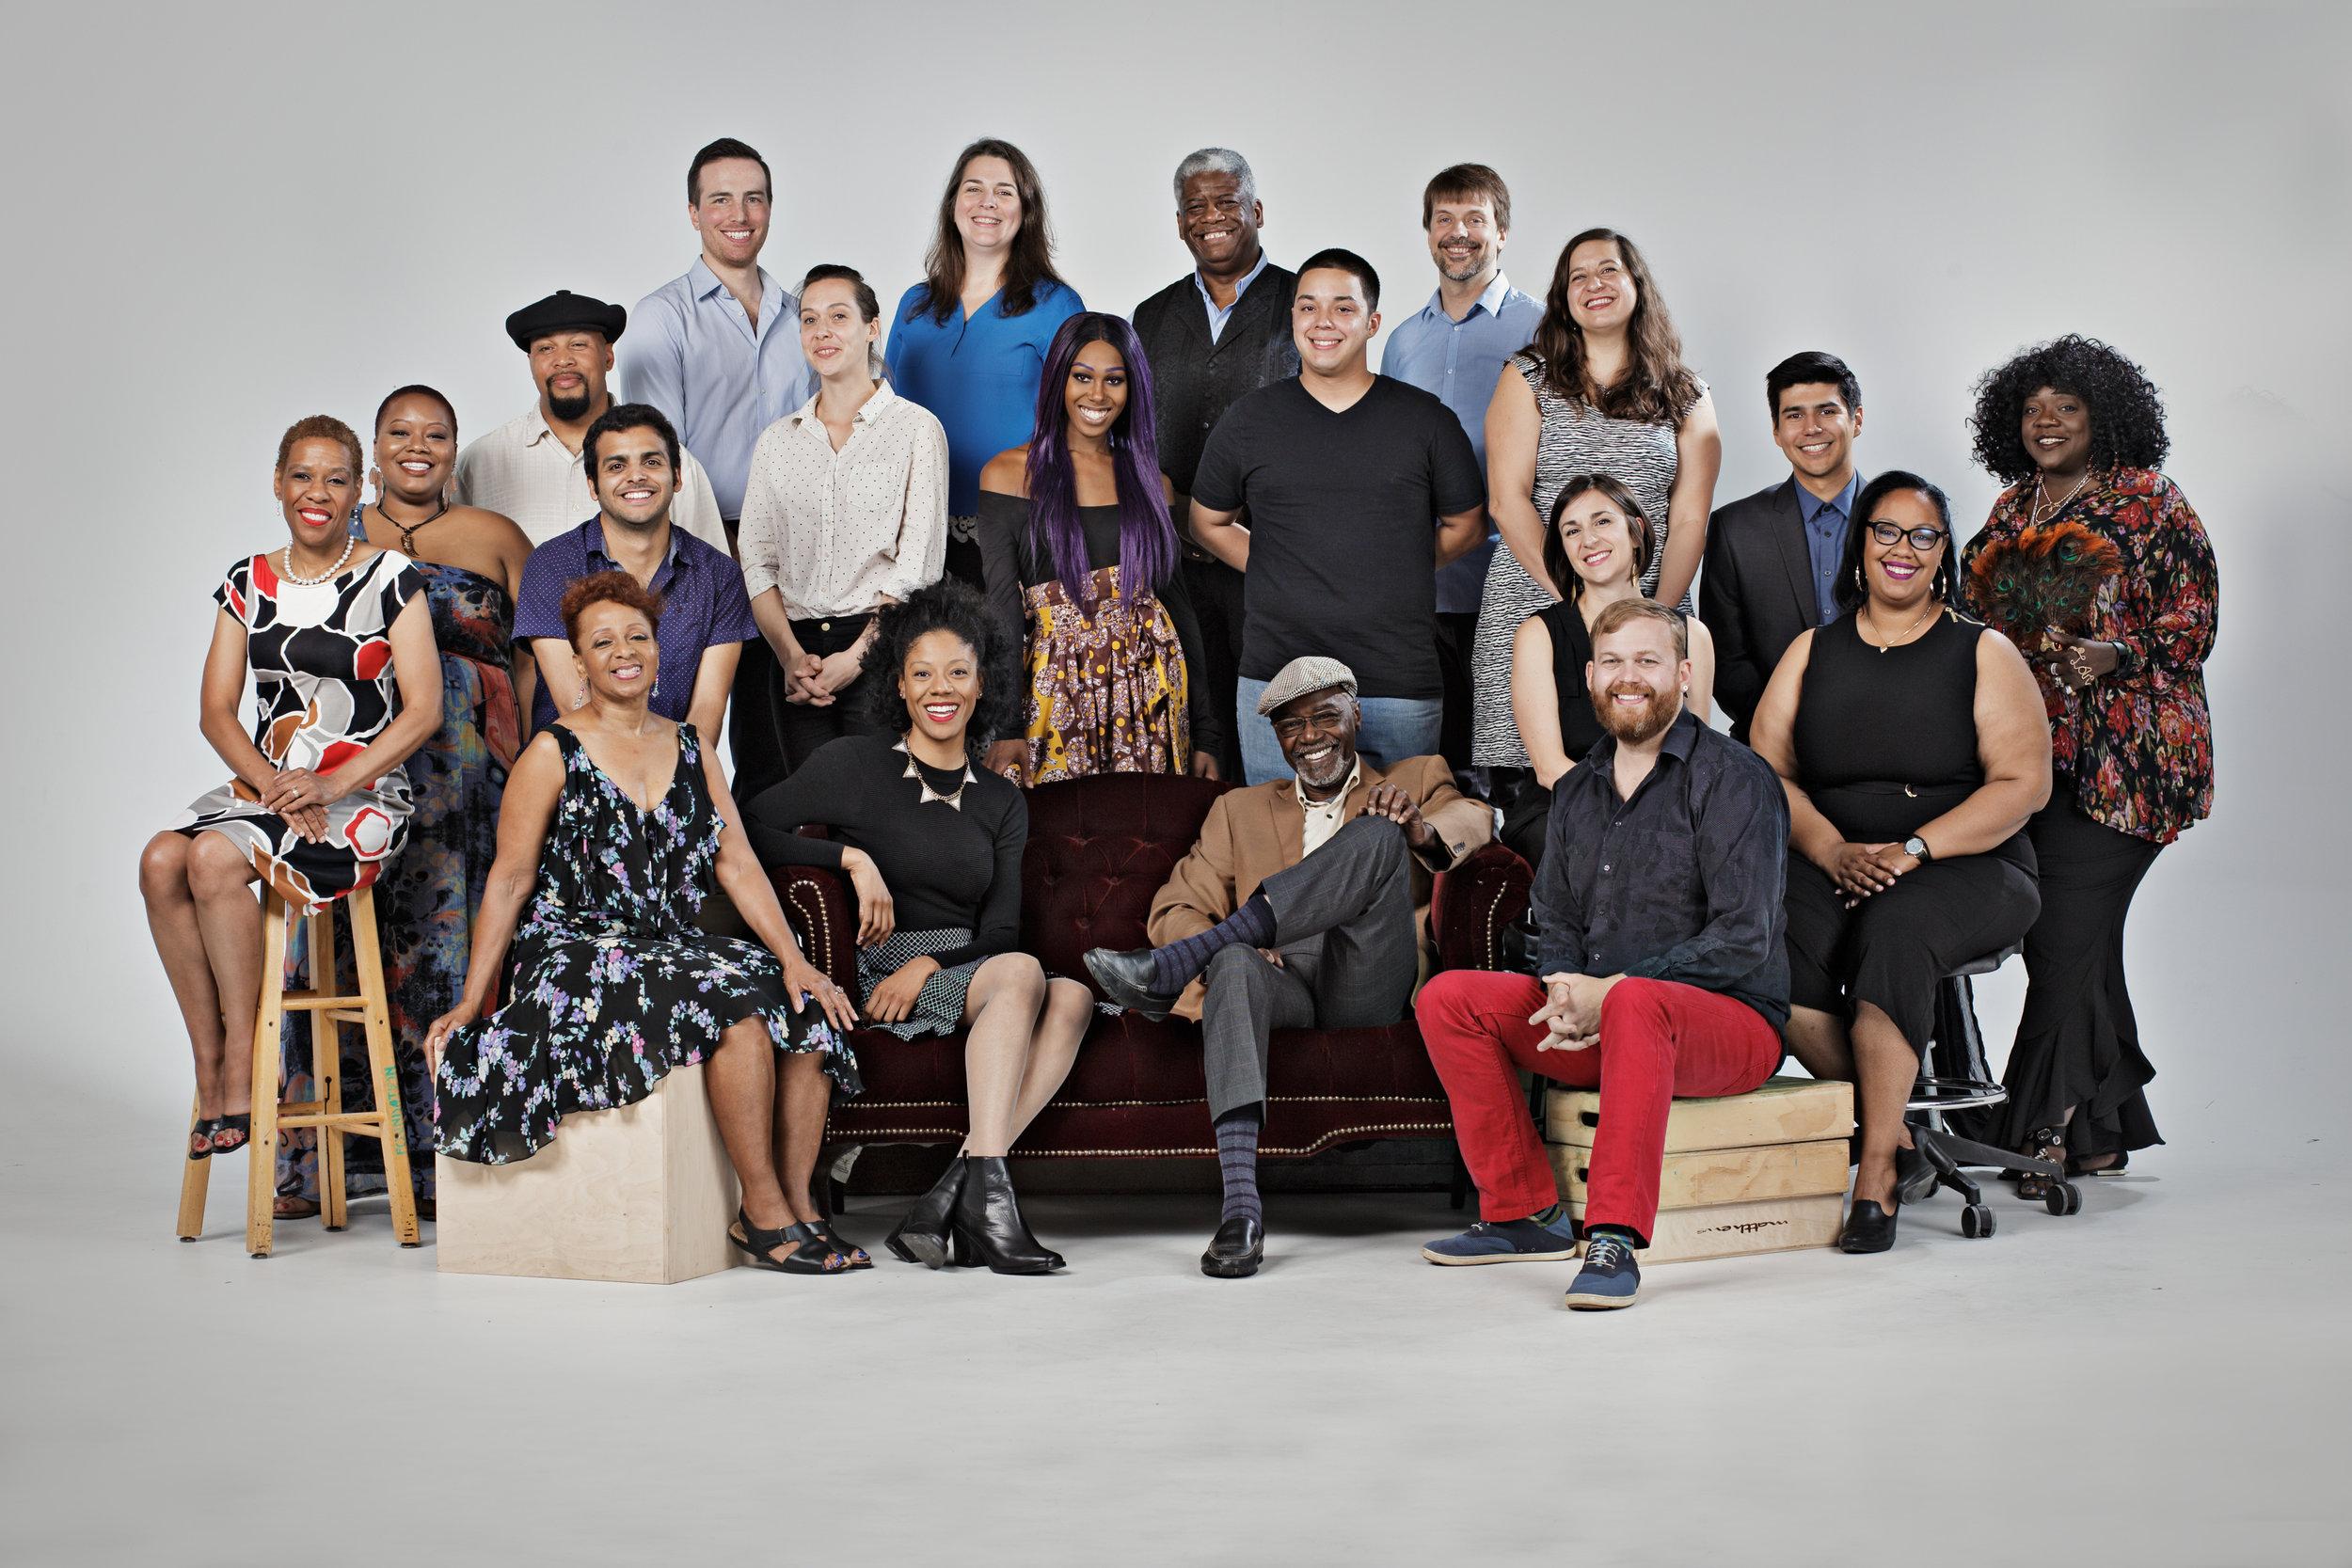 The 2018 Kresge Artist Fellows